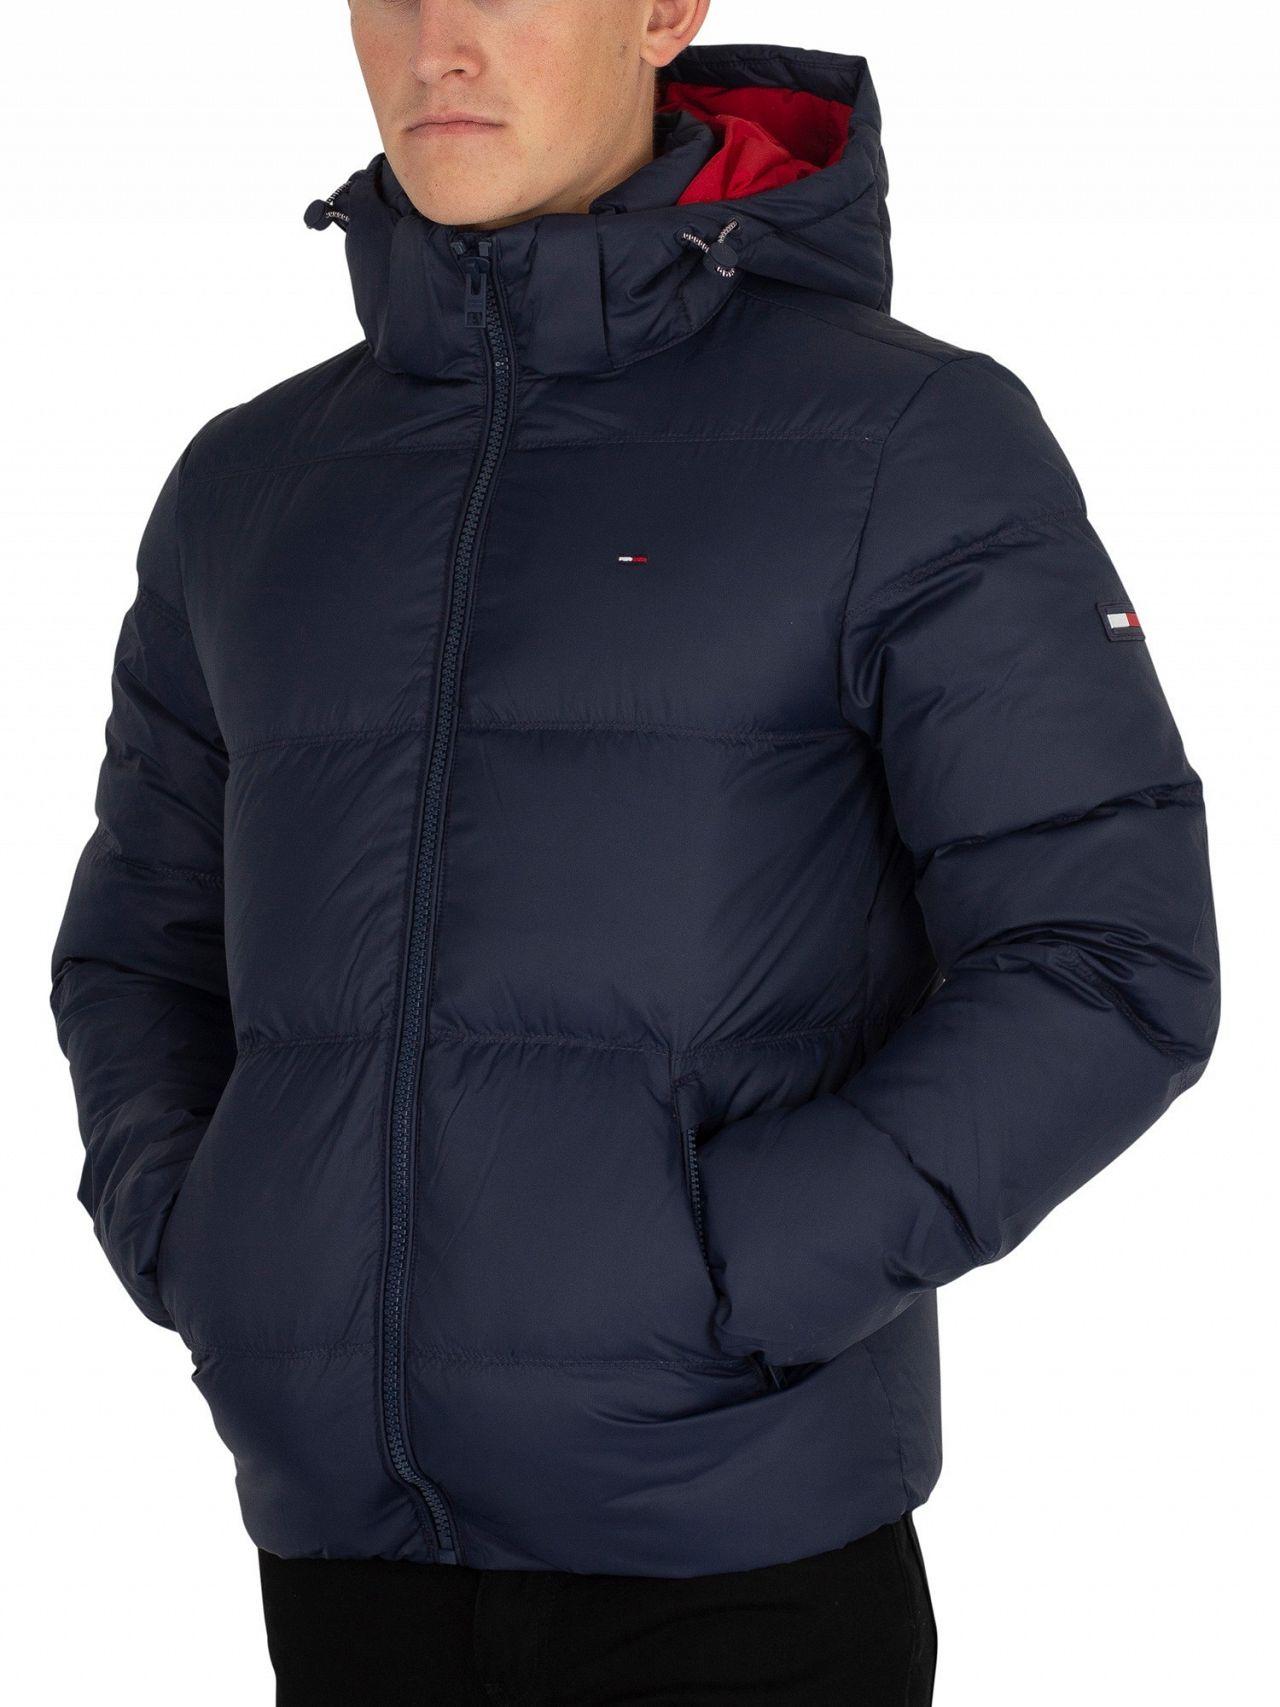 dcf87051e Tommy Jeans Black Iris Navy Essential Down Jacket | Standout